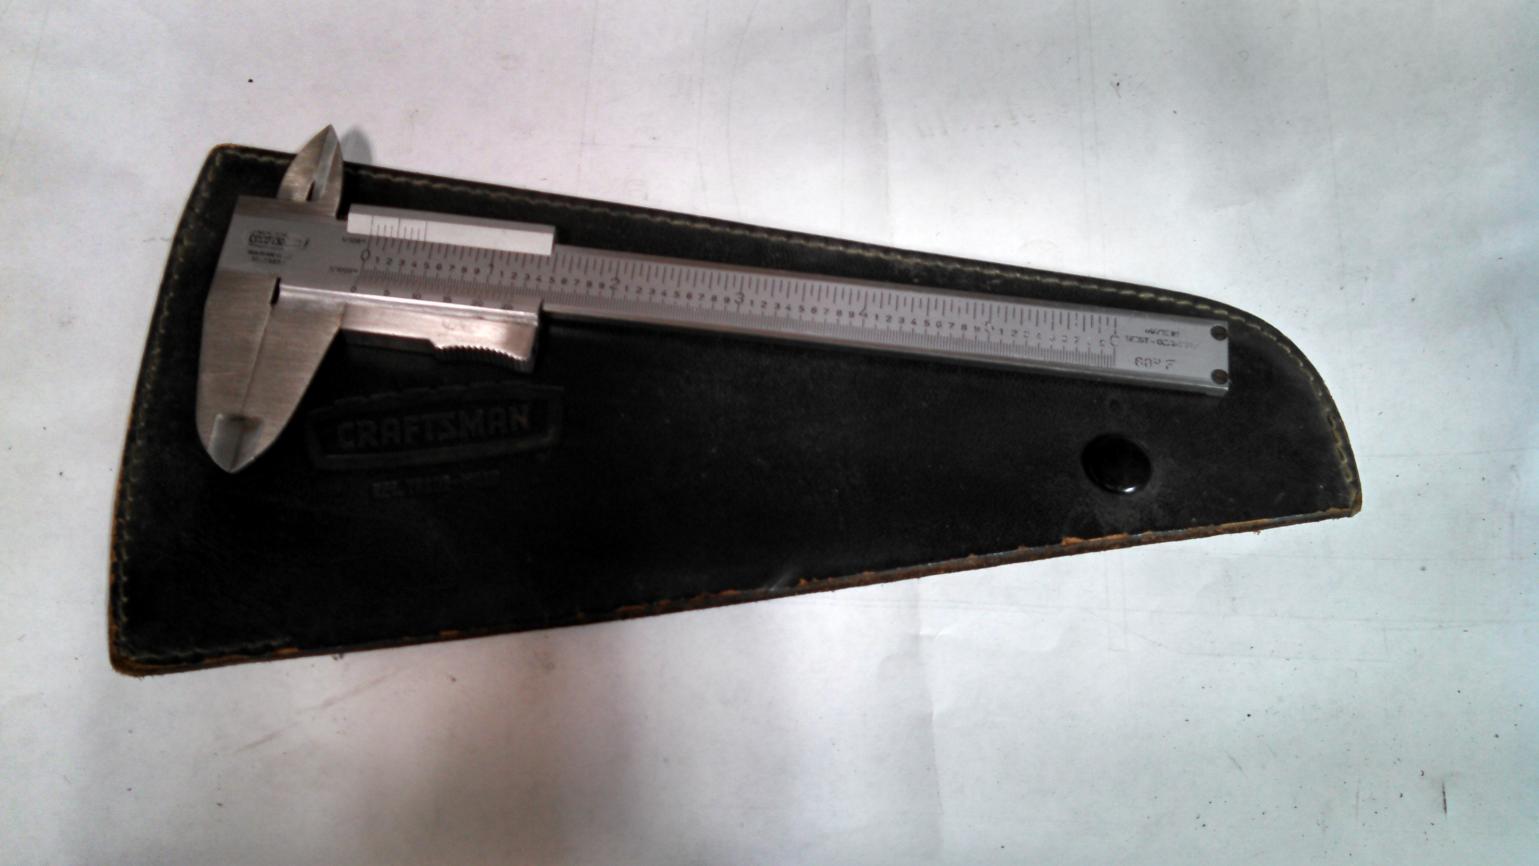 How To Use Vernier Caliper >> FS. Vernier caliper, German, Craftsman